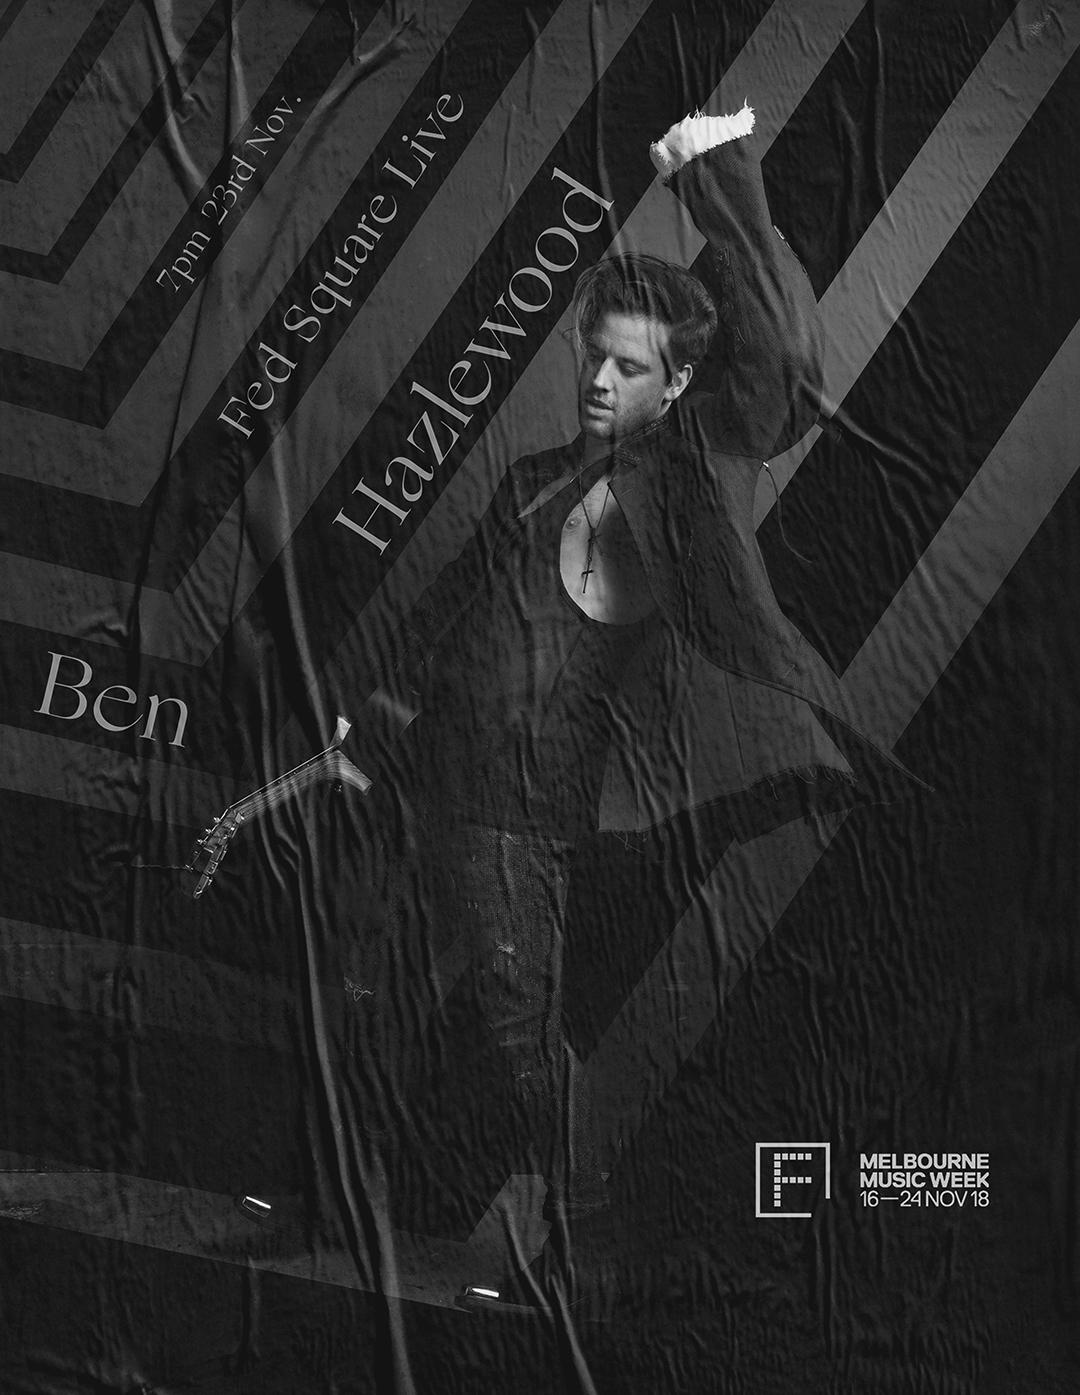 BH_Melbourne_Poster.jpg